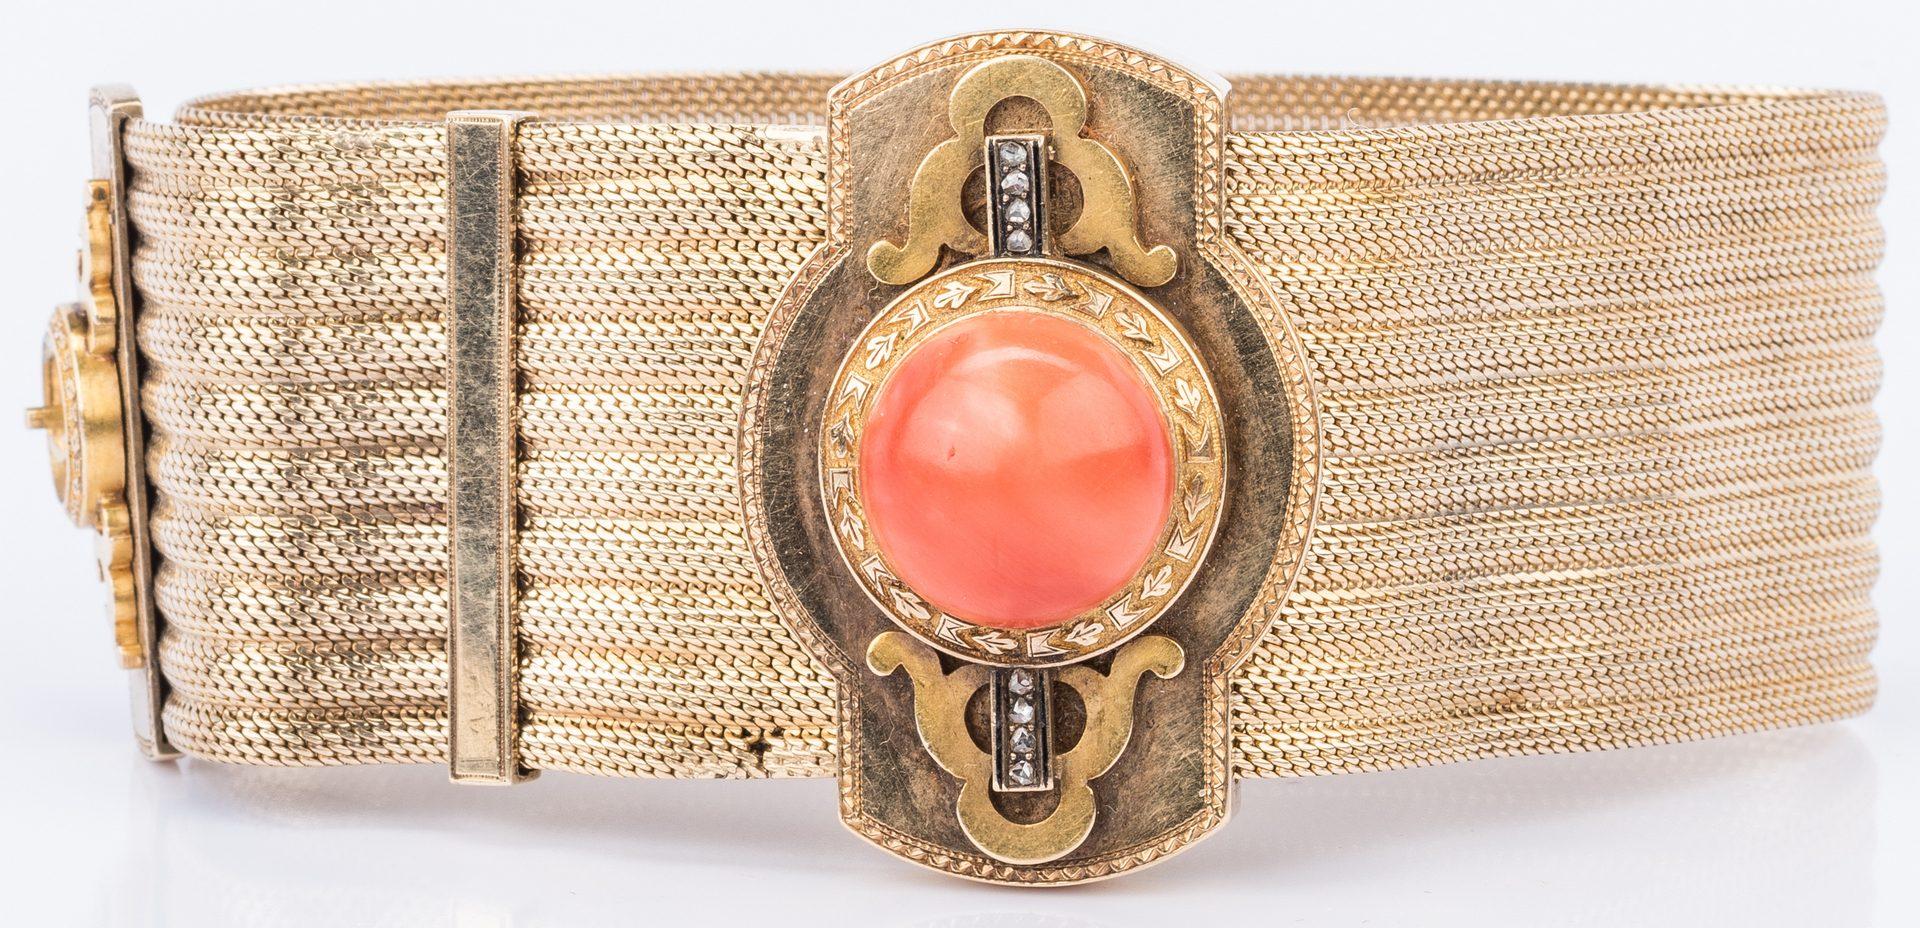 Lot 214: 3 14K Jewelry Items, inc. Slide Bracelet